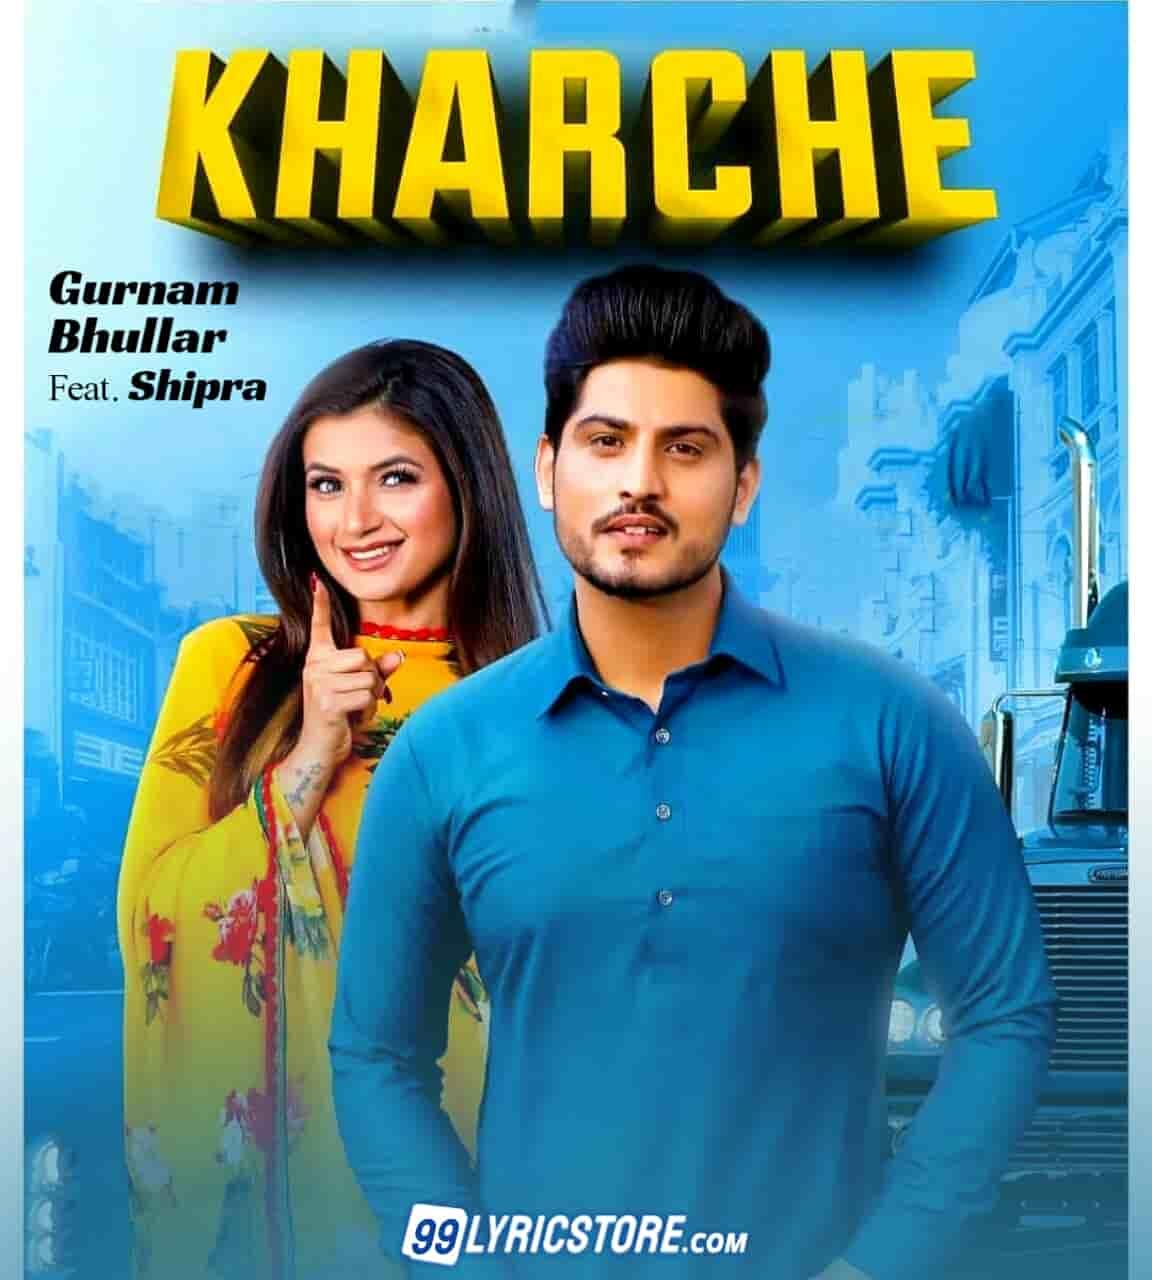 Kharche Punjabi Song Lyrics Sung by Gurnam Bhullar Feat. Shipra Goyal